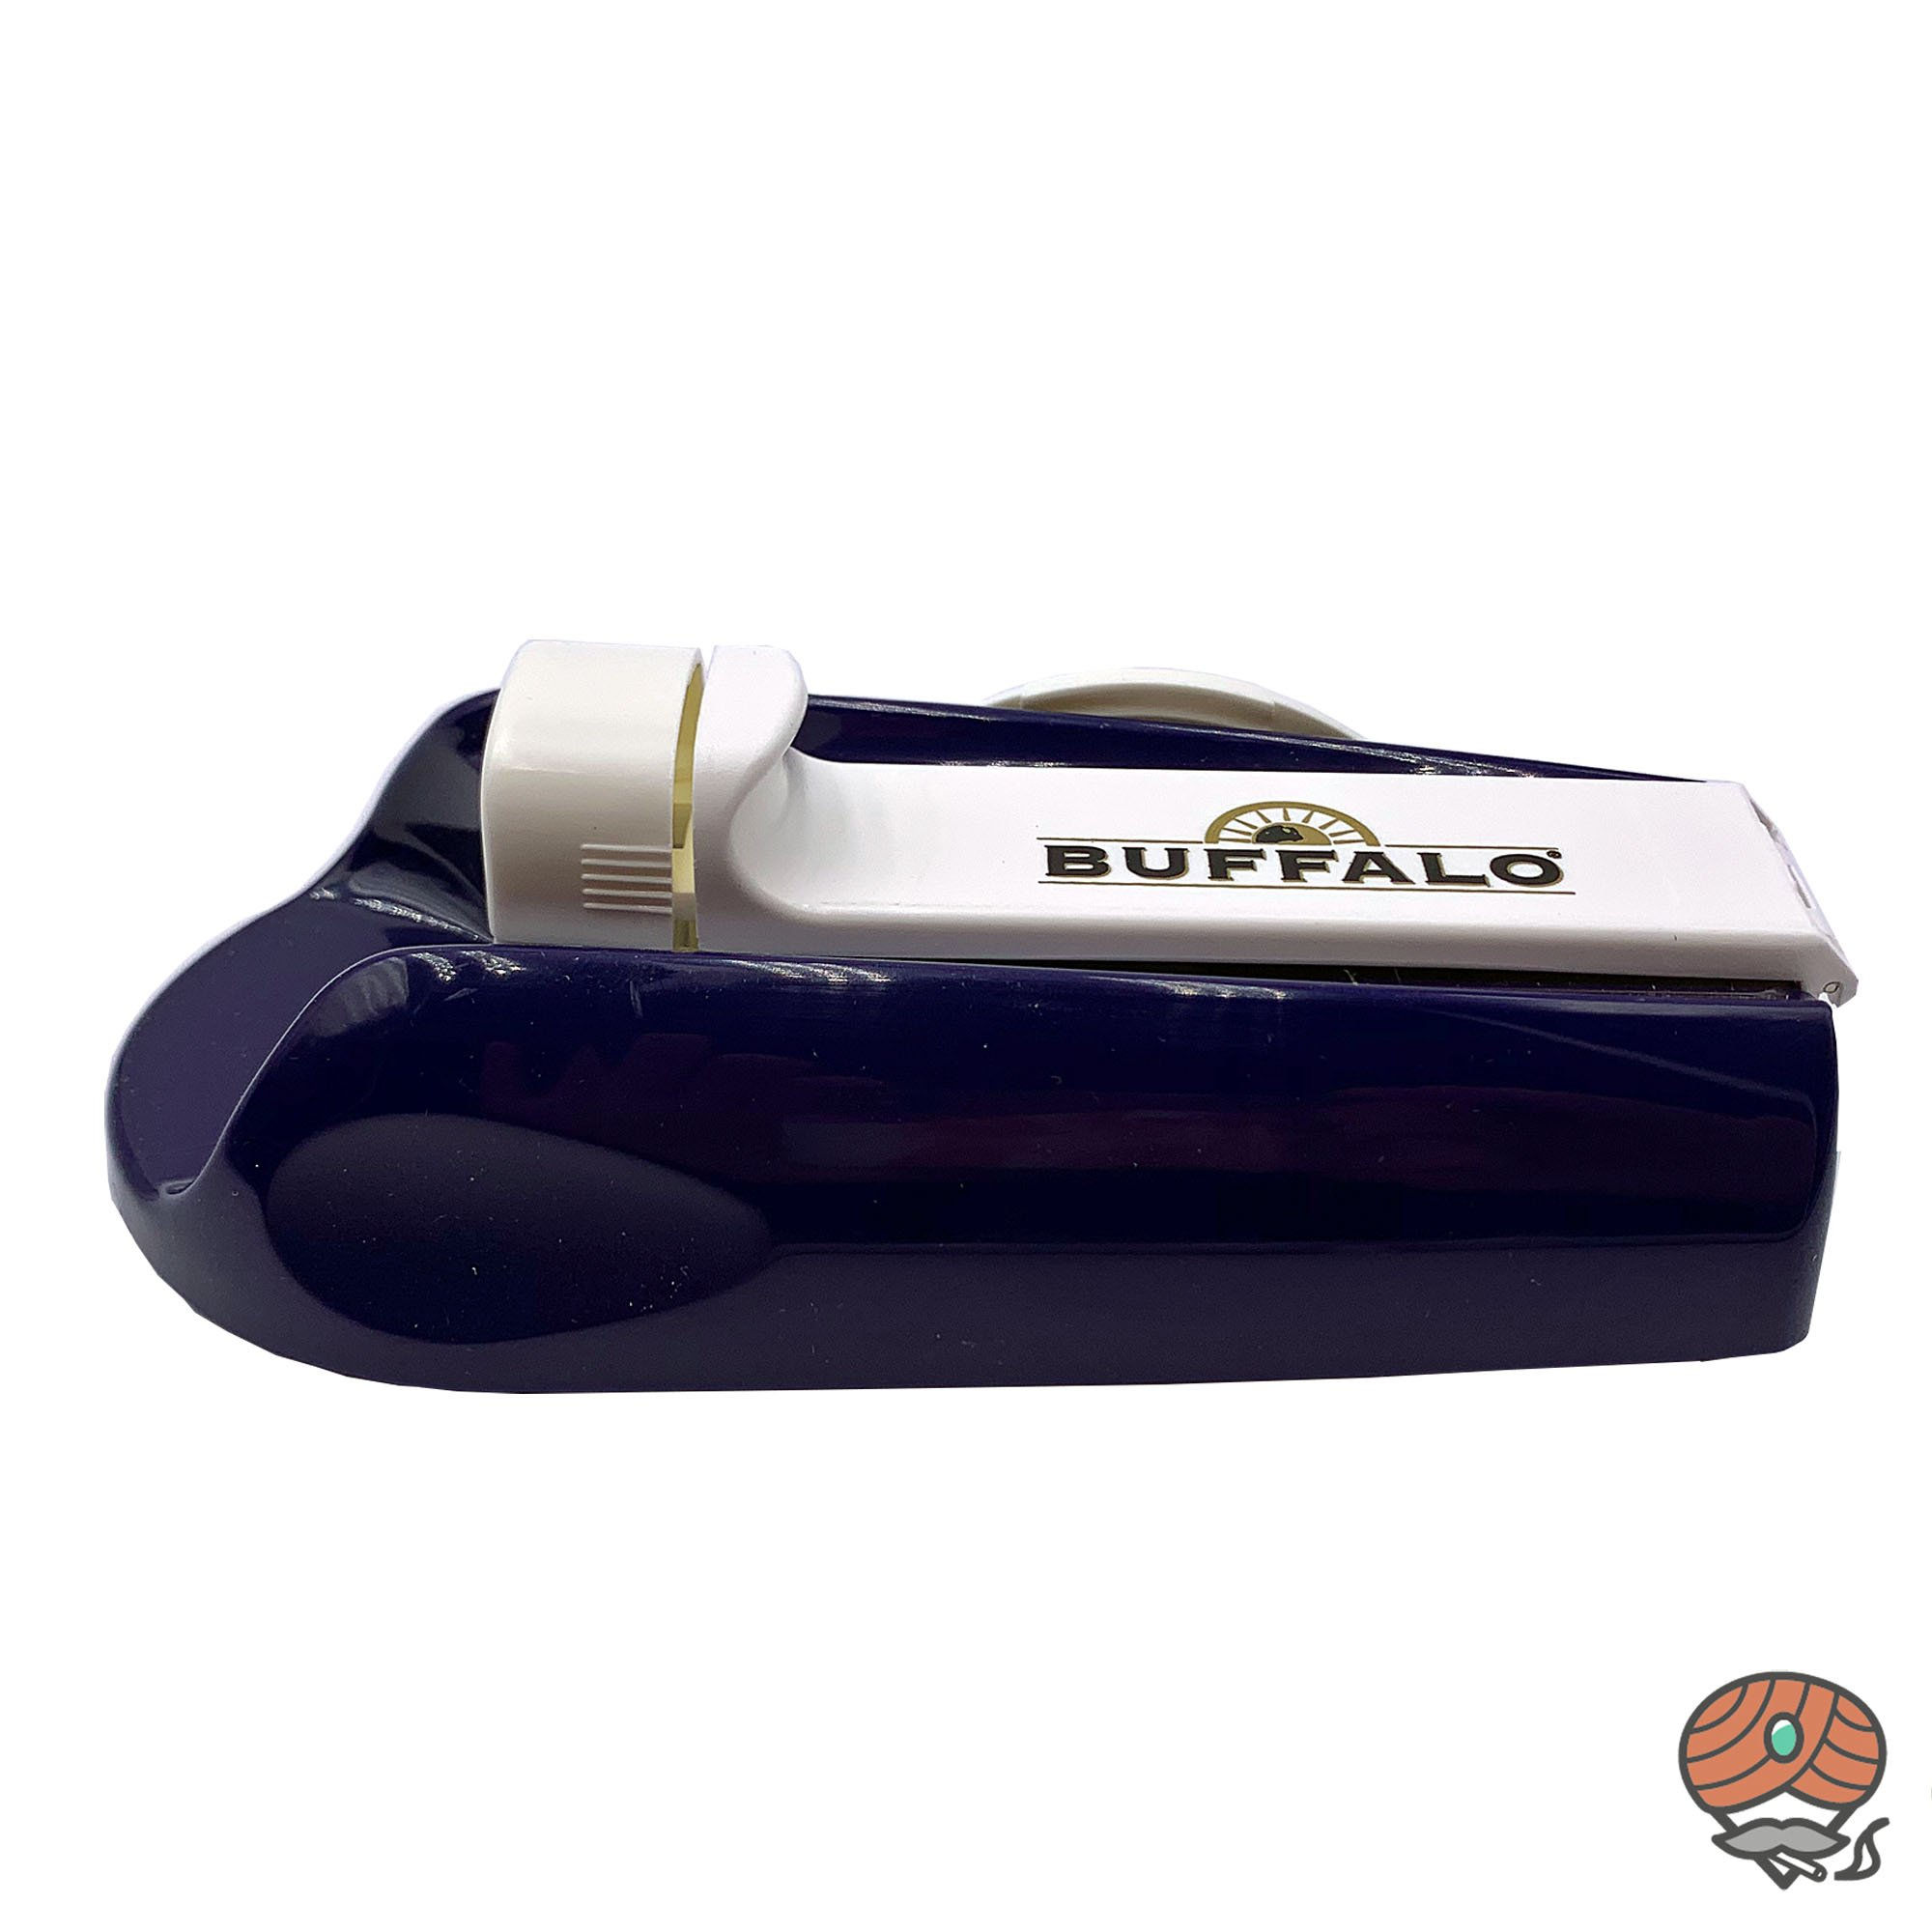 Buffalo de Luxe Zigarettenstopfmaschine, Stopfer, Stopfmaschine